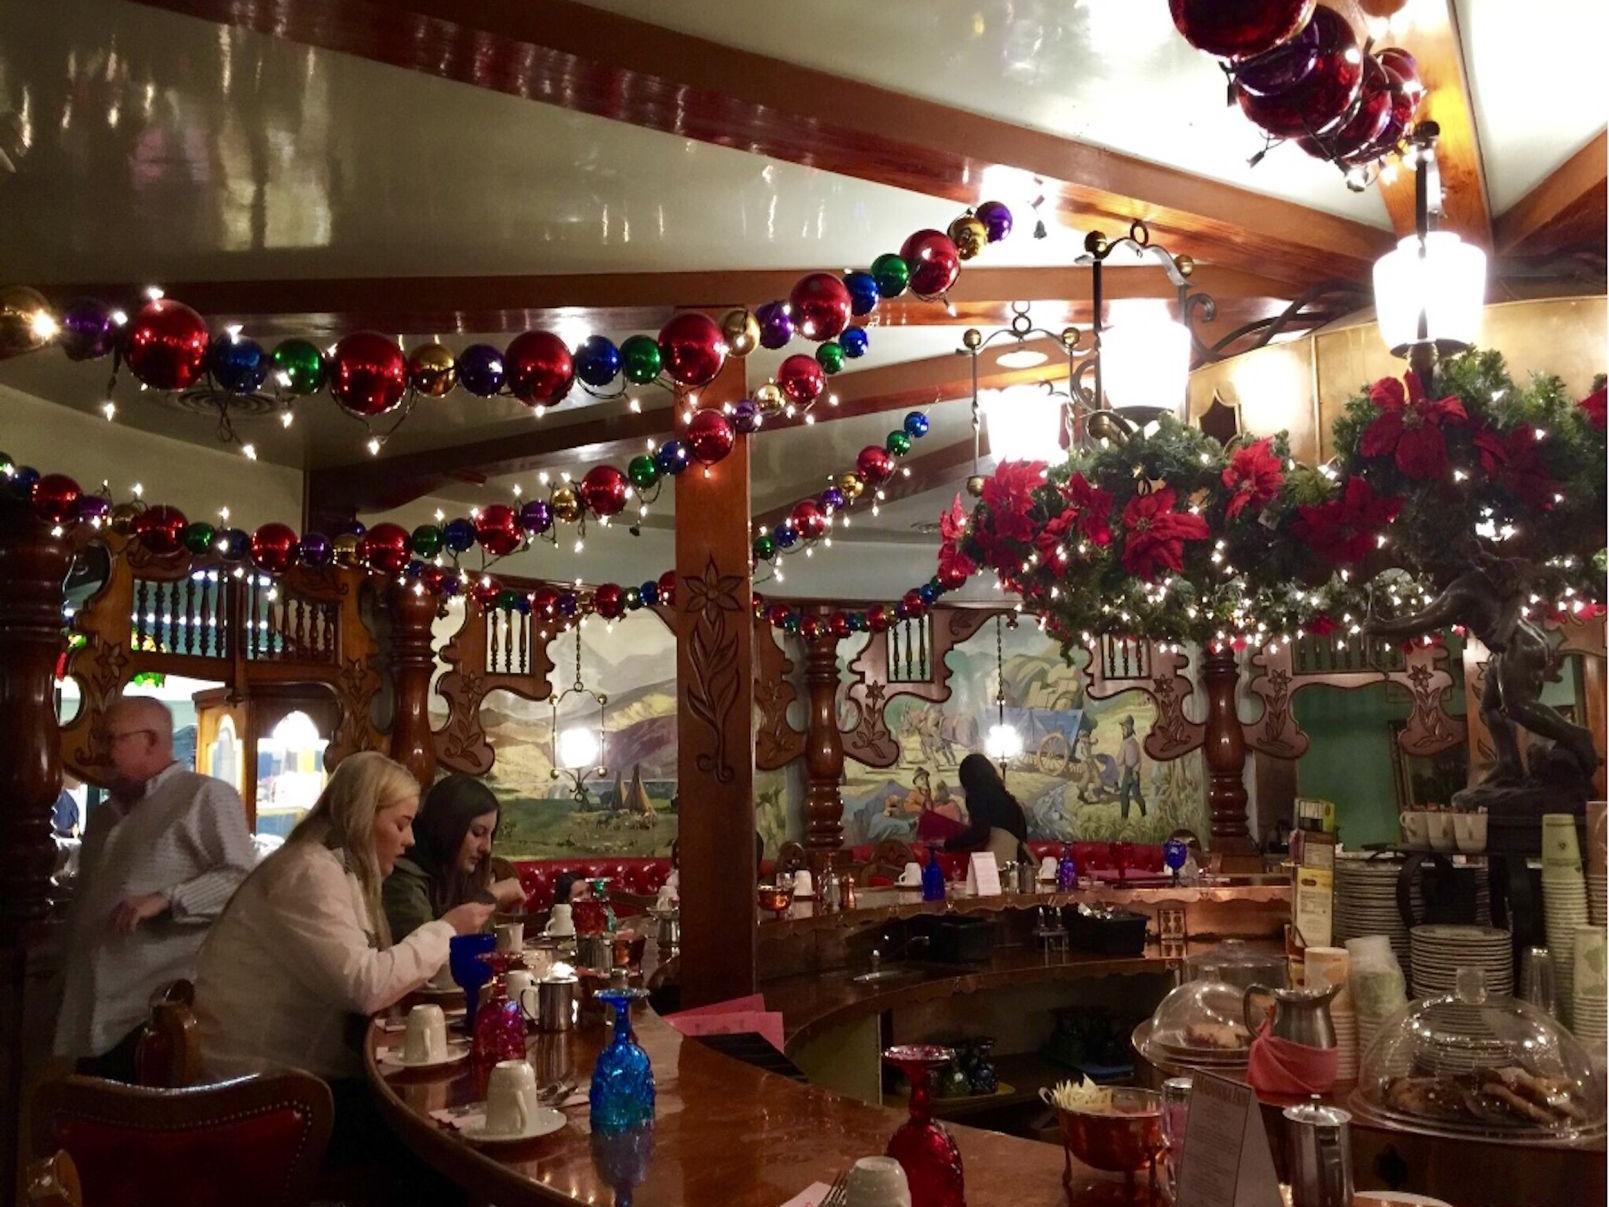 Donna Polizzi Madonna Inn Lights Up The Central Coast With Holiday Cheer Columns Syvnews Com